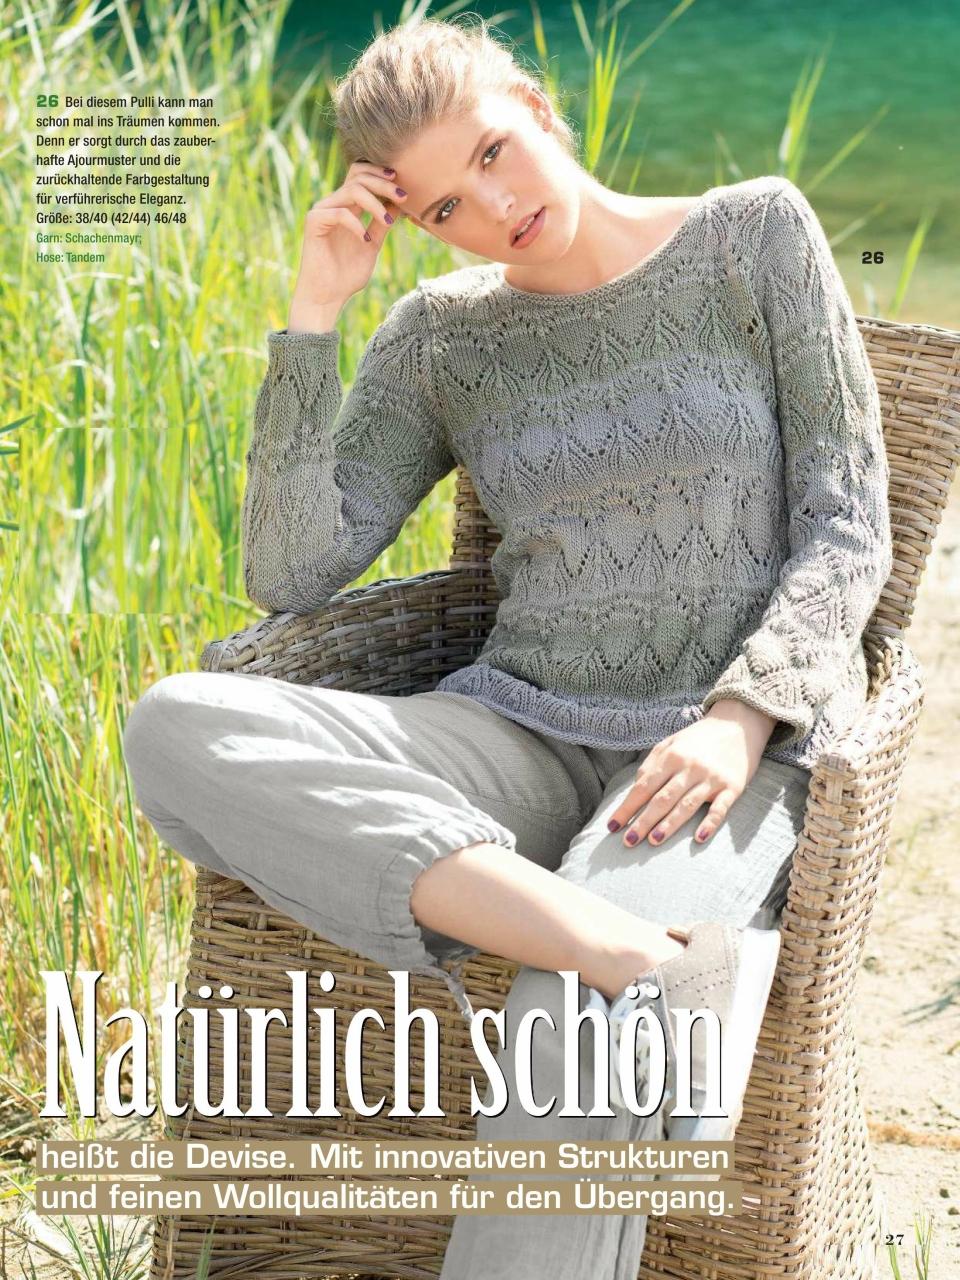 Sabrina 2017-2 (Deutsch) - 编织幸福 - 编织幸福的博客